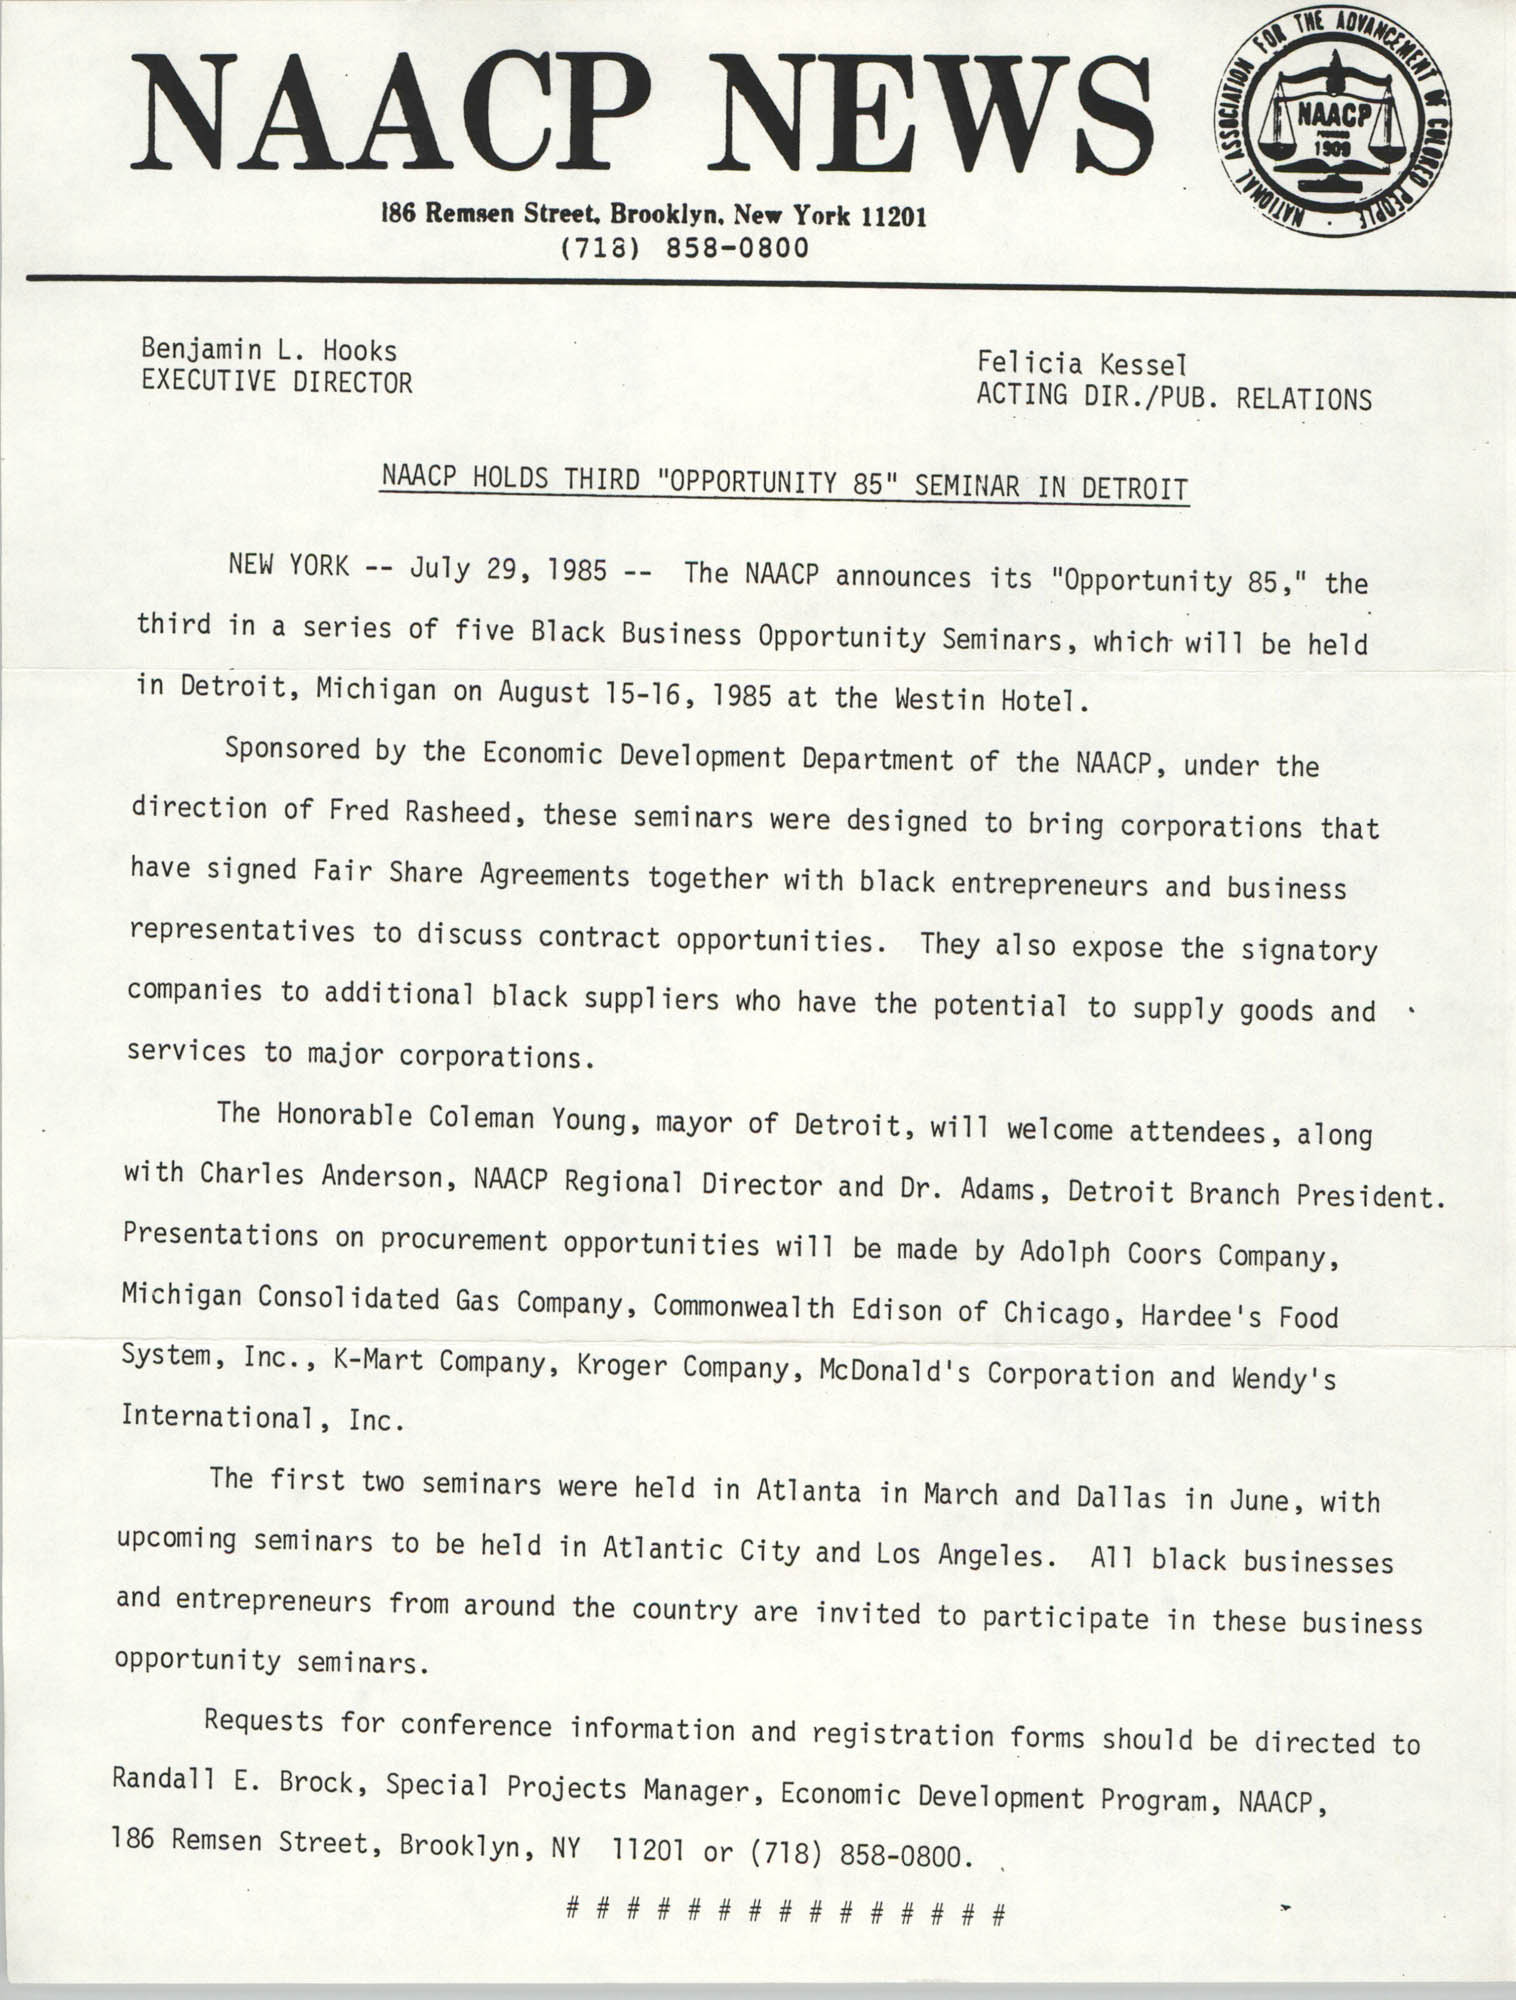 NAACP News Statement, June 29, 1985